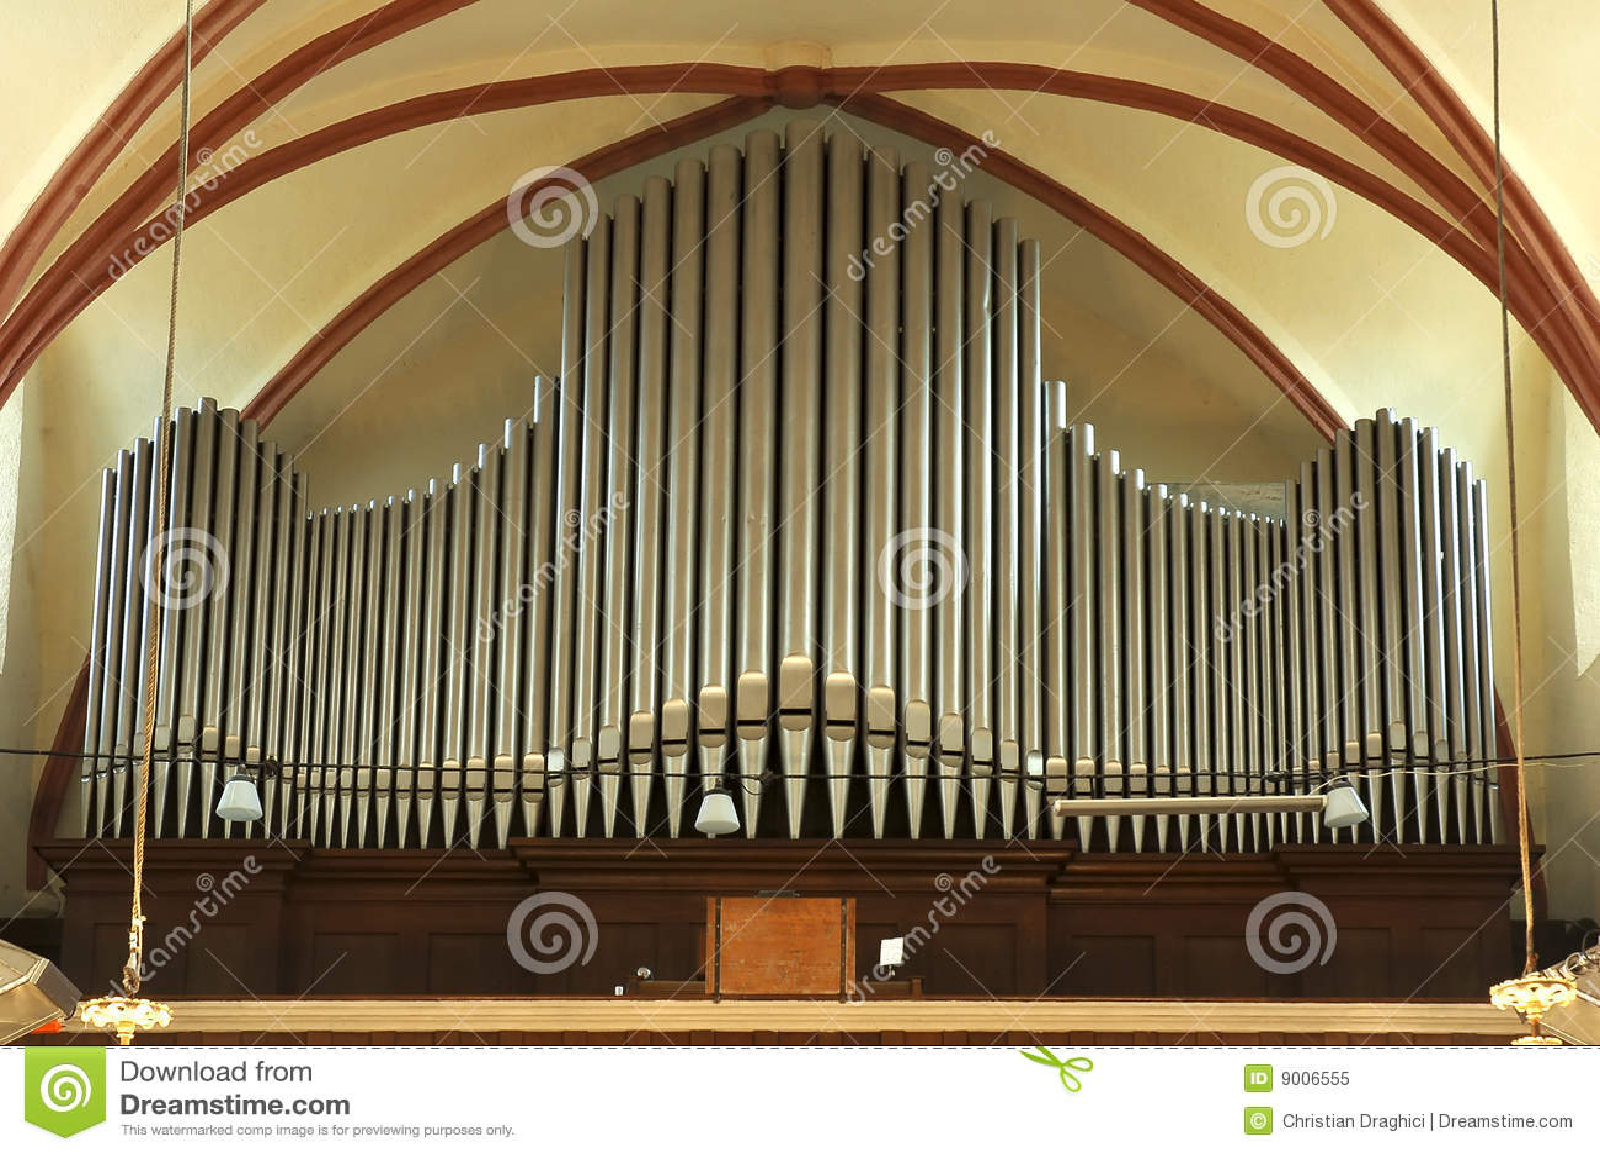 Viejo órgano de tubo grande